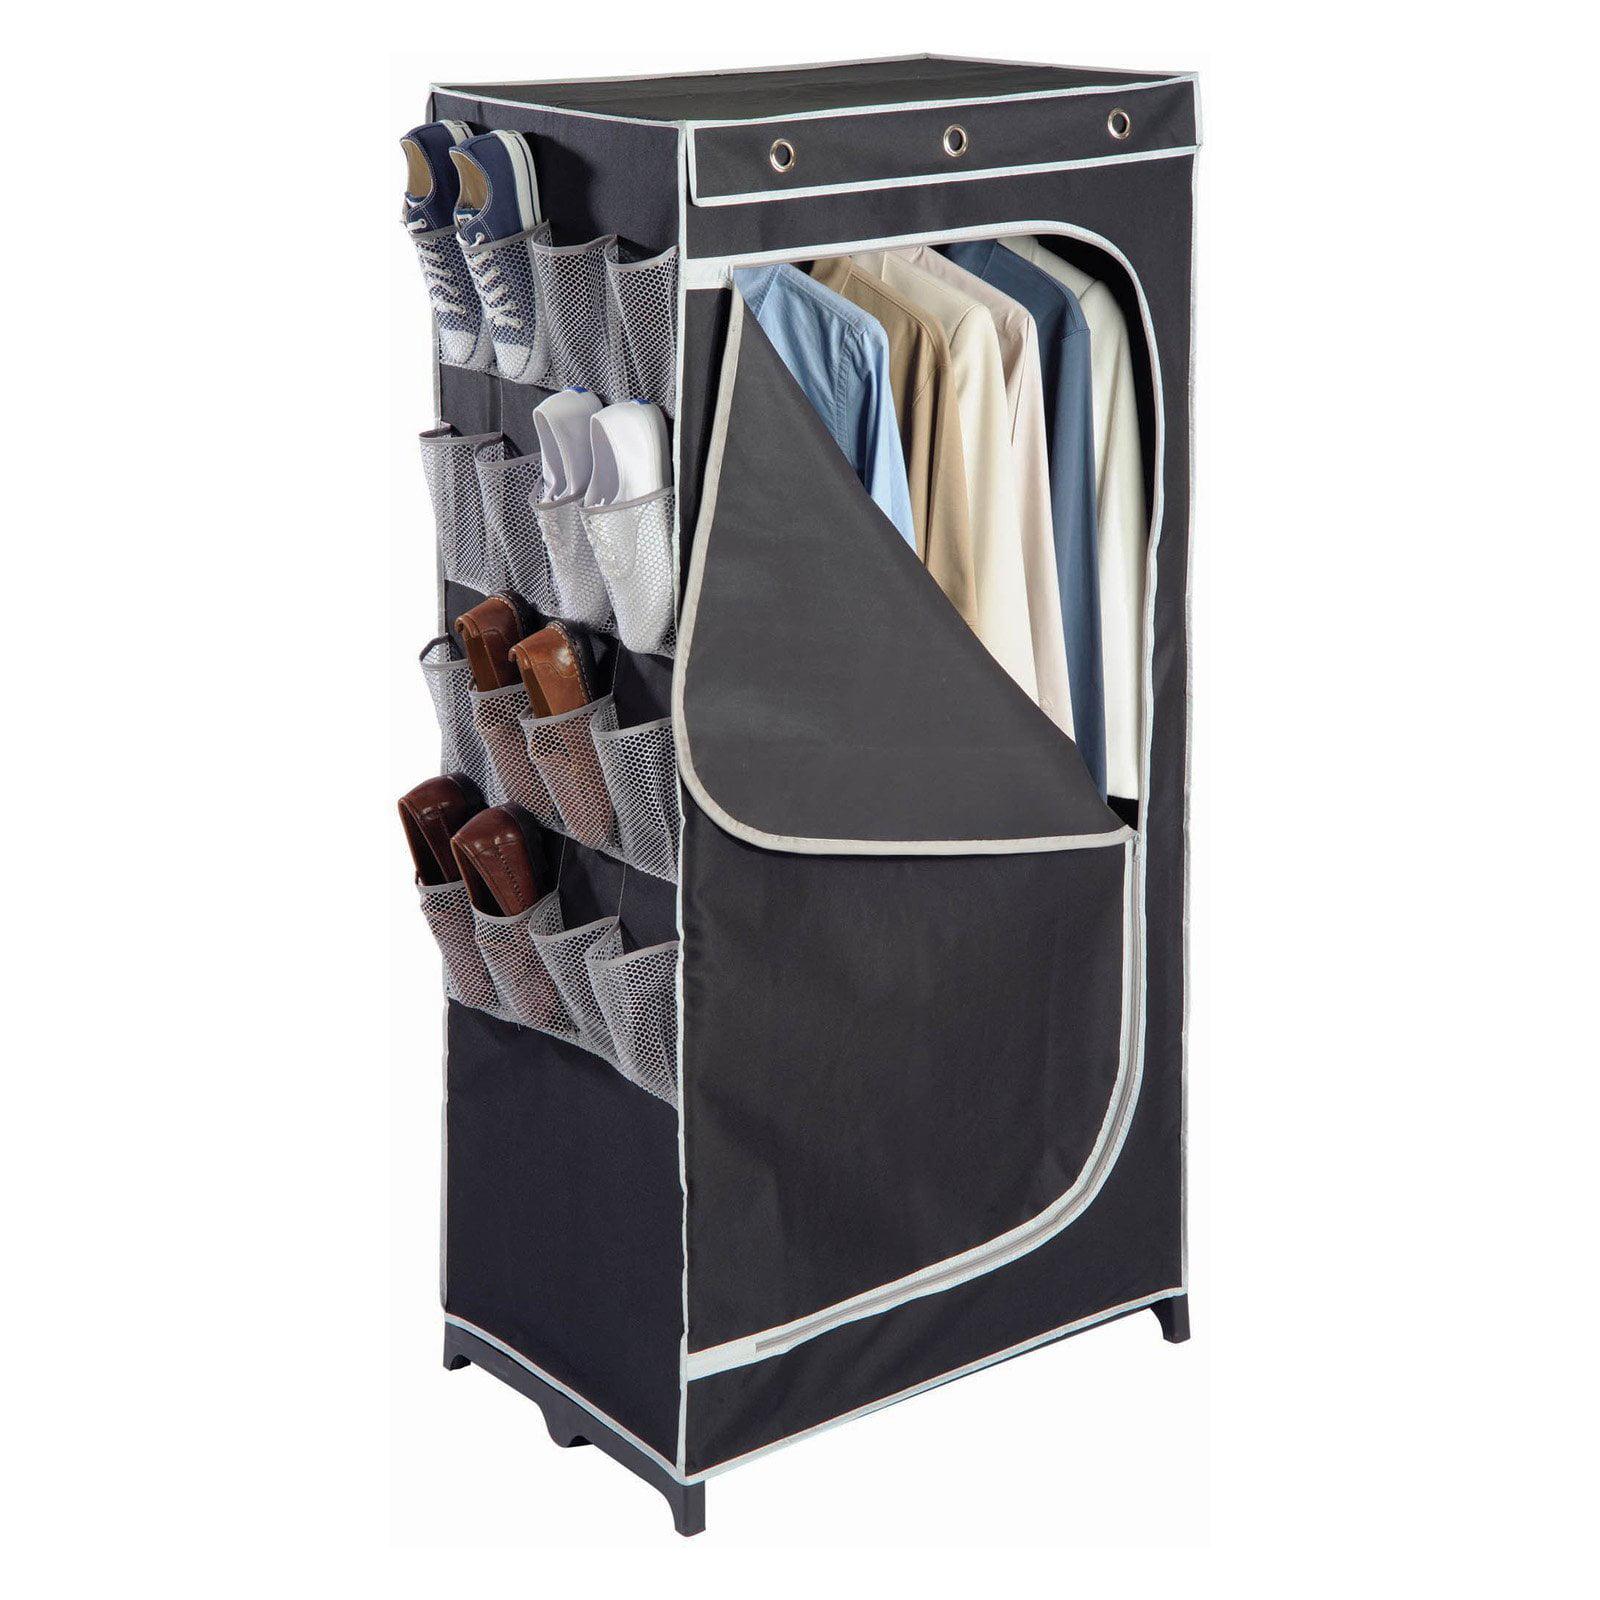 Richards Homewares 30 in. Wardrobe with Mesh Pockets - Black/Silver